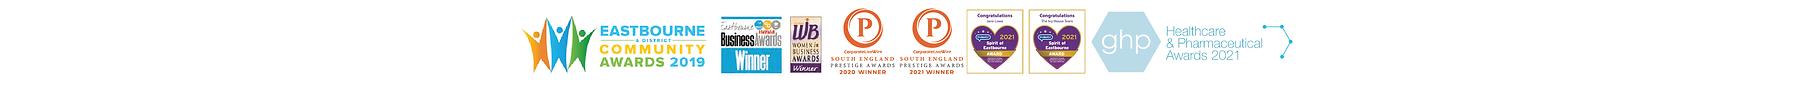 ivy_awards_footer.png